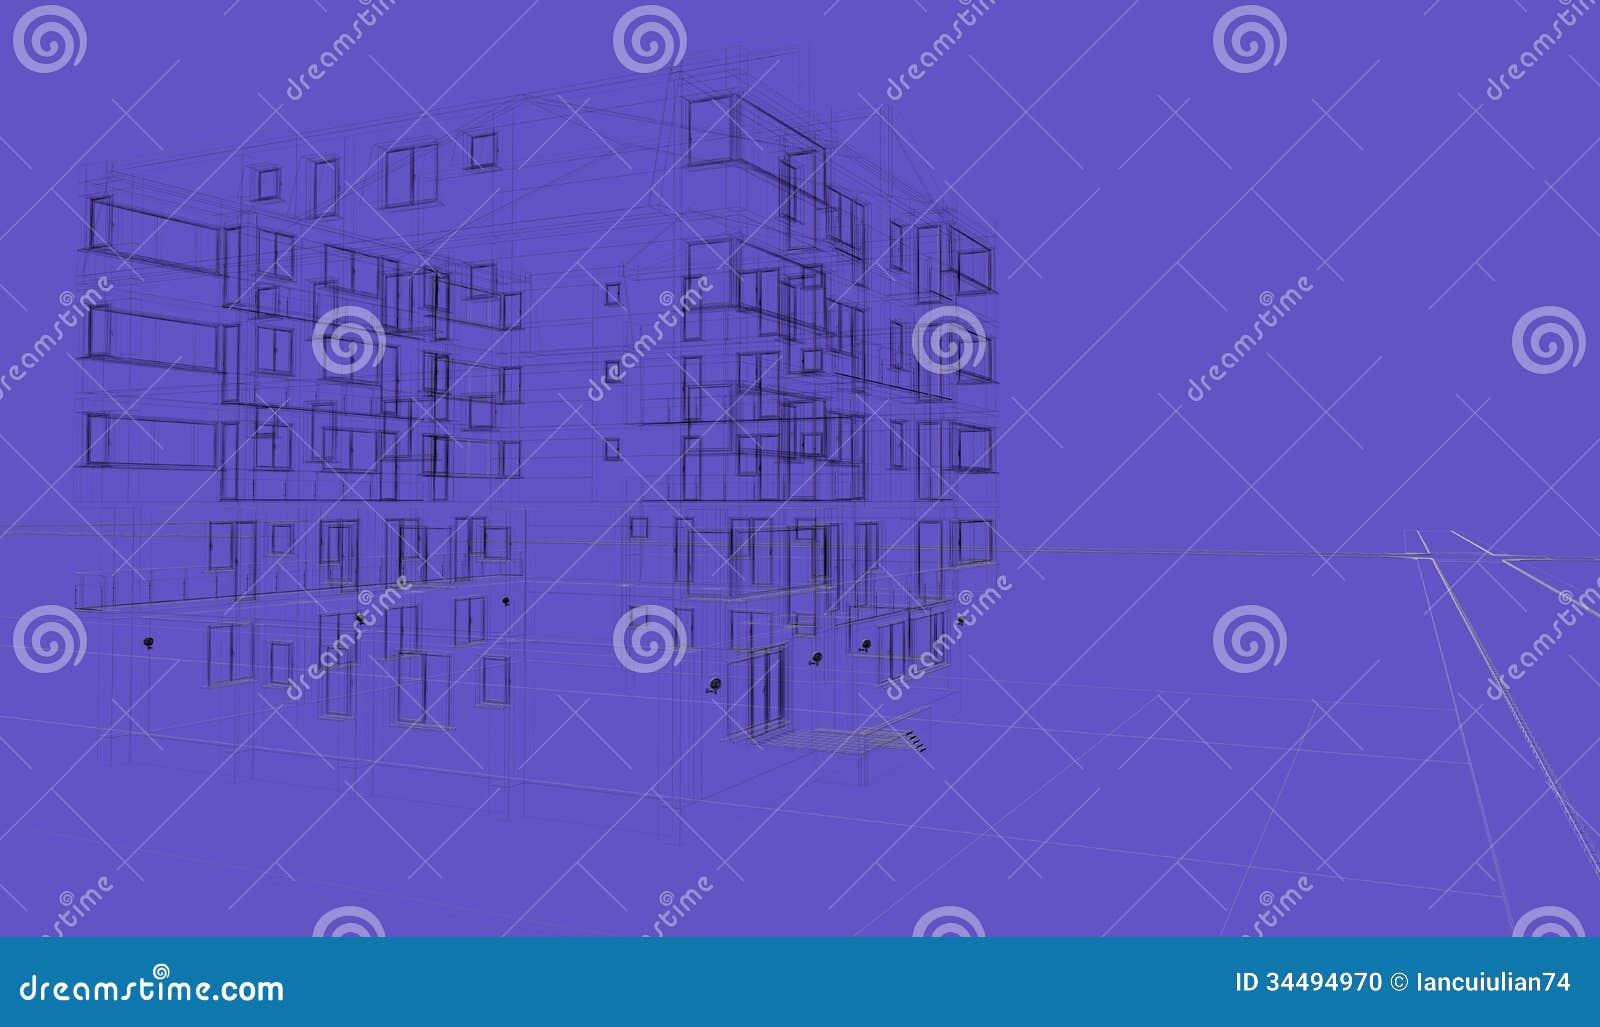 Buiten blauwe achtergrond die wireframes ontwerp die architectuur teruggeven bouwen stock foto - Ontwerp buitenkant ontwerp ...